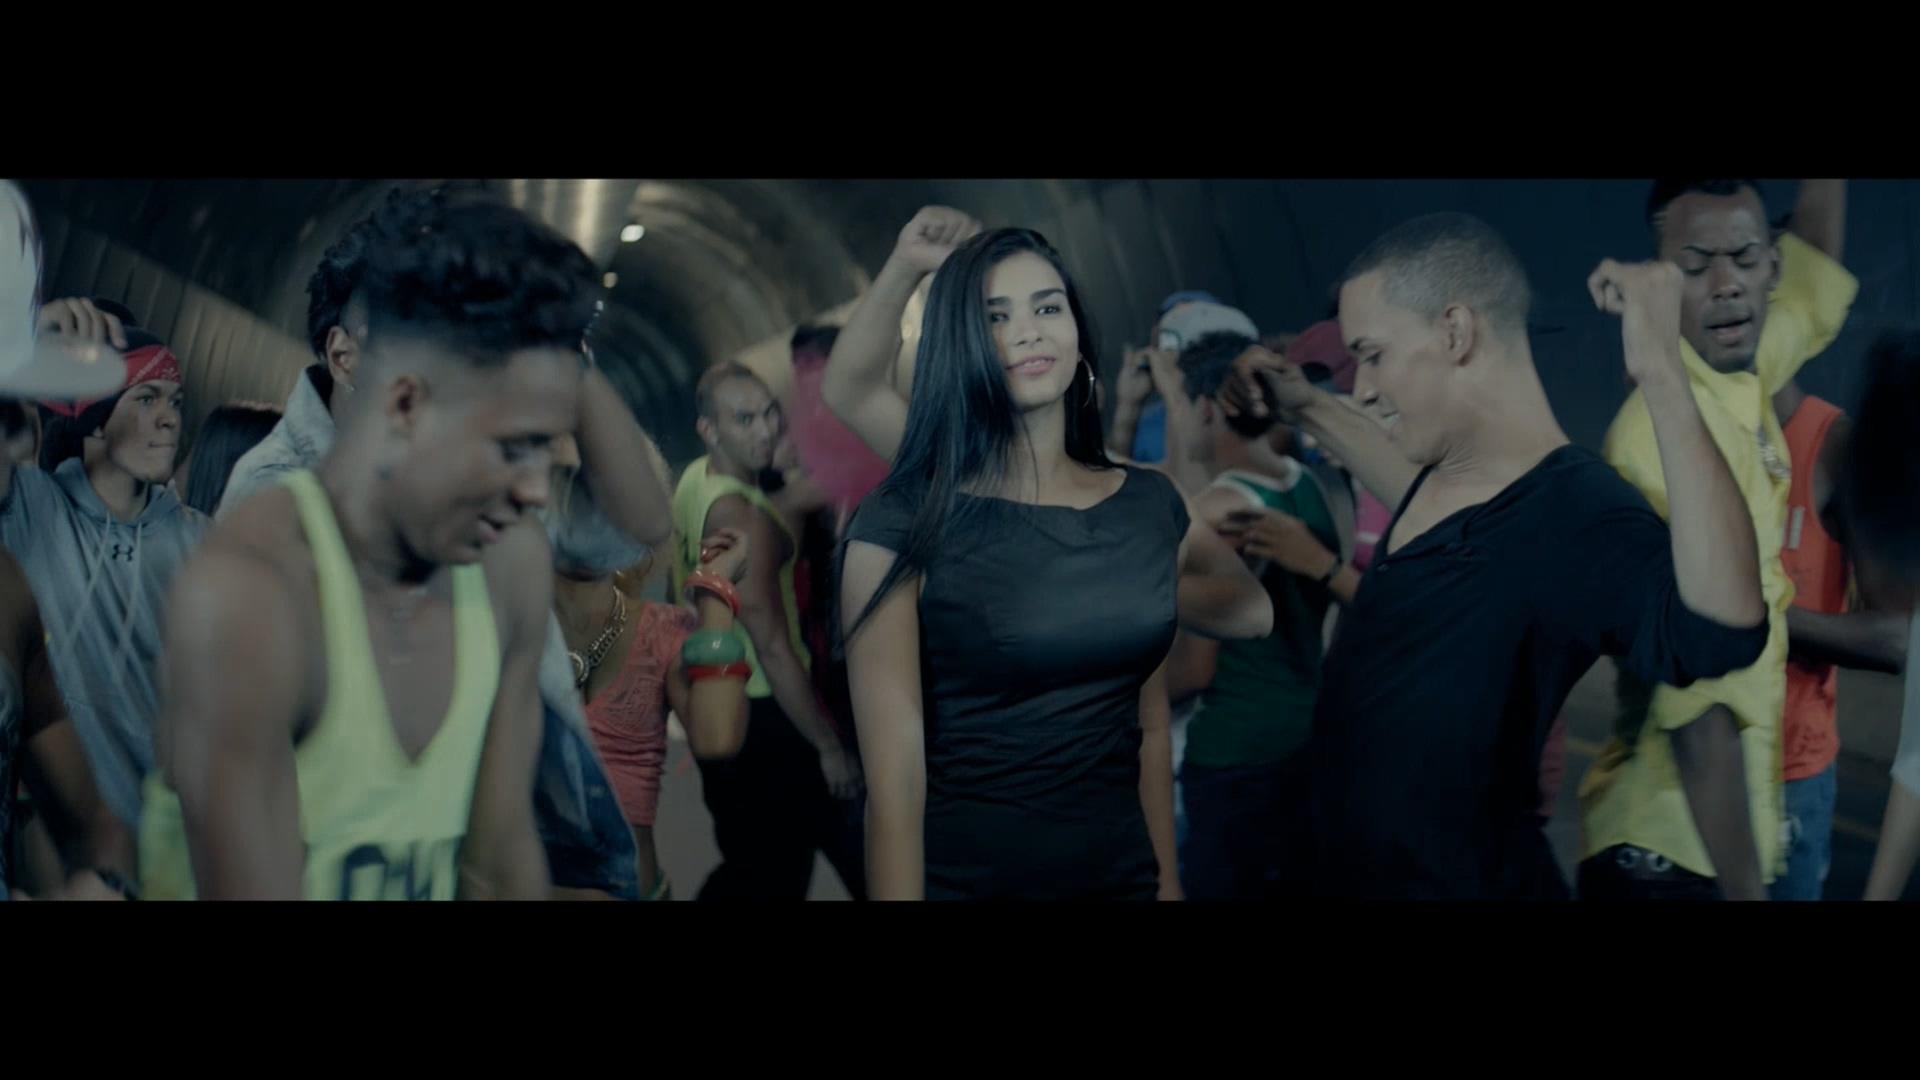 Enrique Iglesias - Bailando (Español) ft. Descemer Bueno, Gente De Zona [Master ProRes 1080p] -JatSen.mov_20201015_220847.910